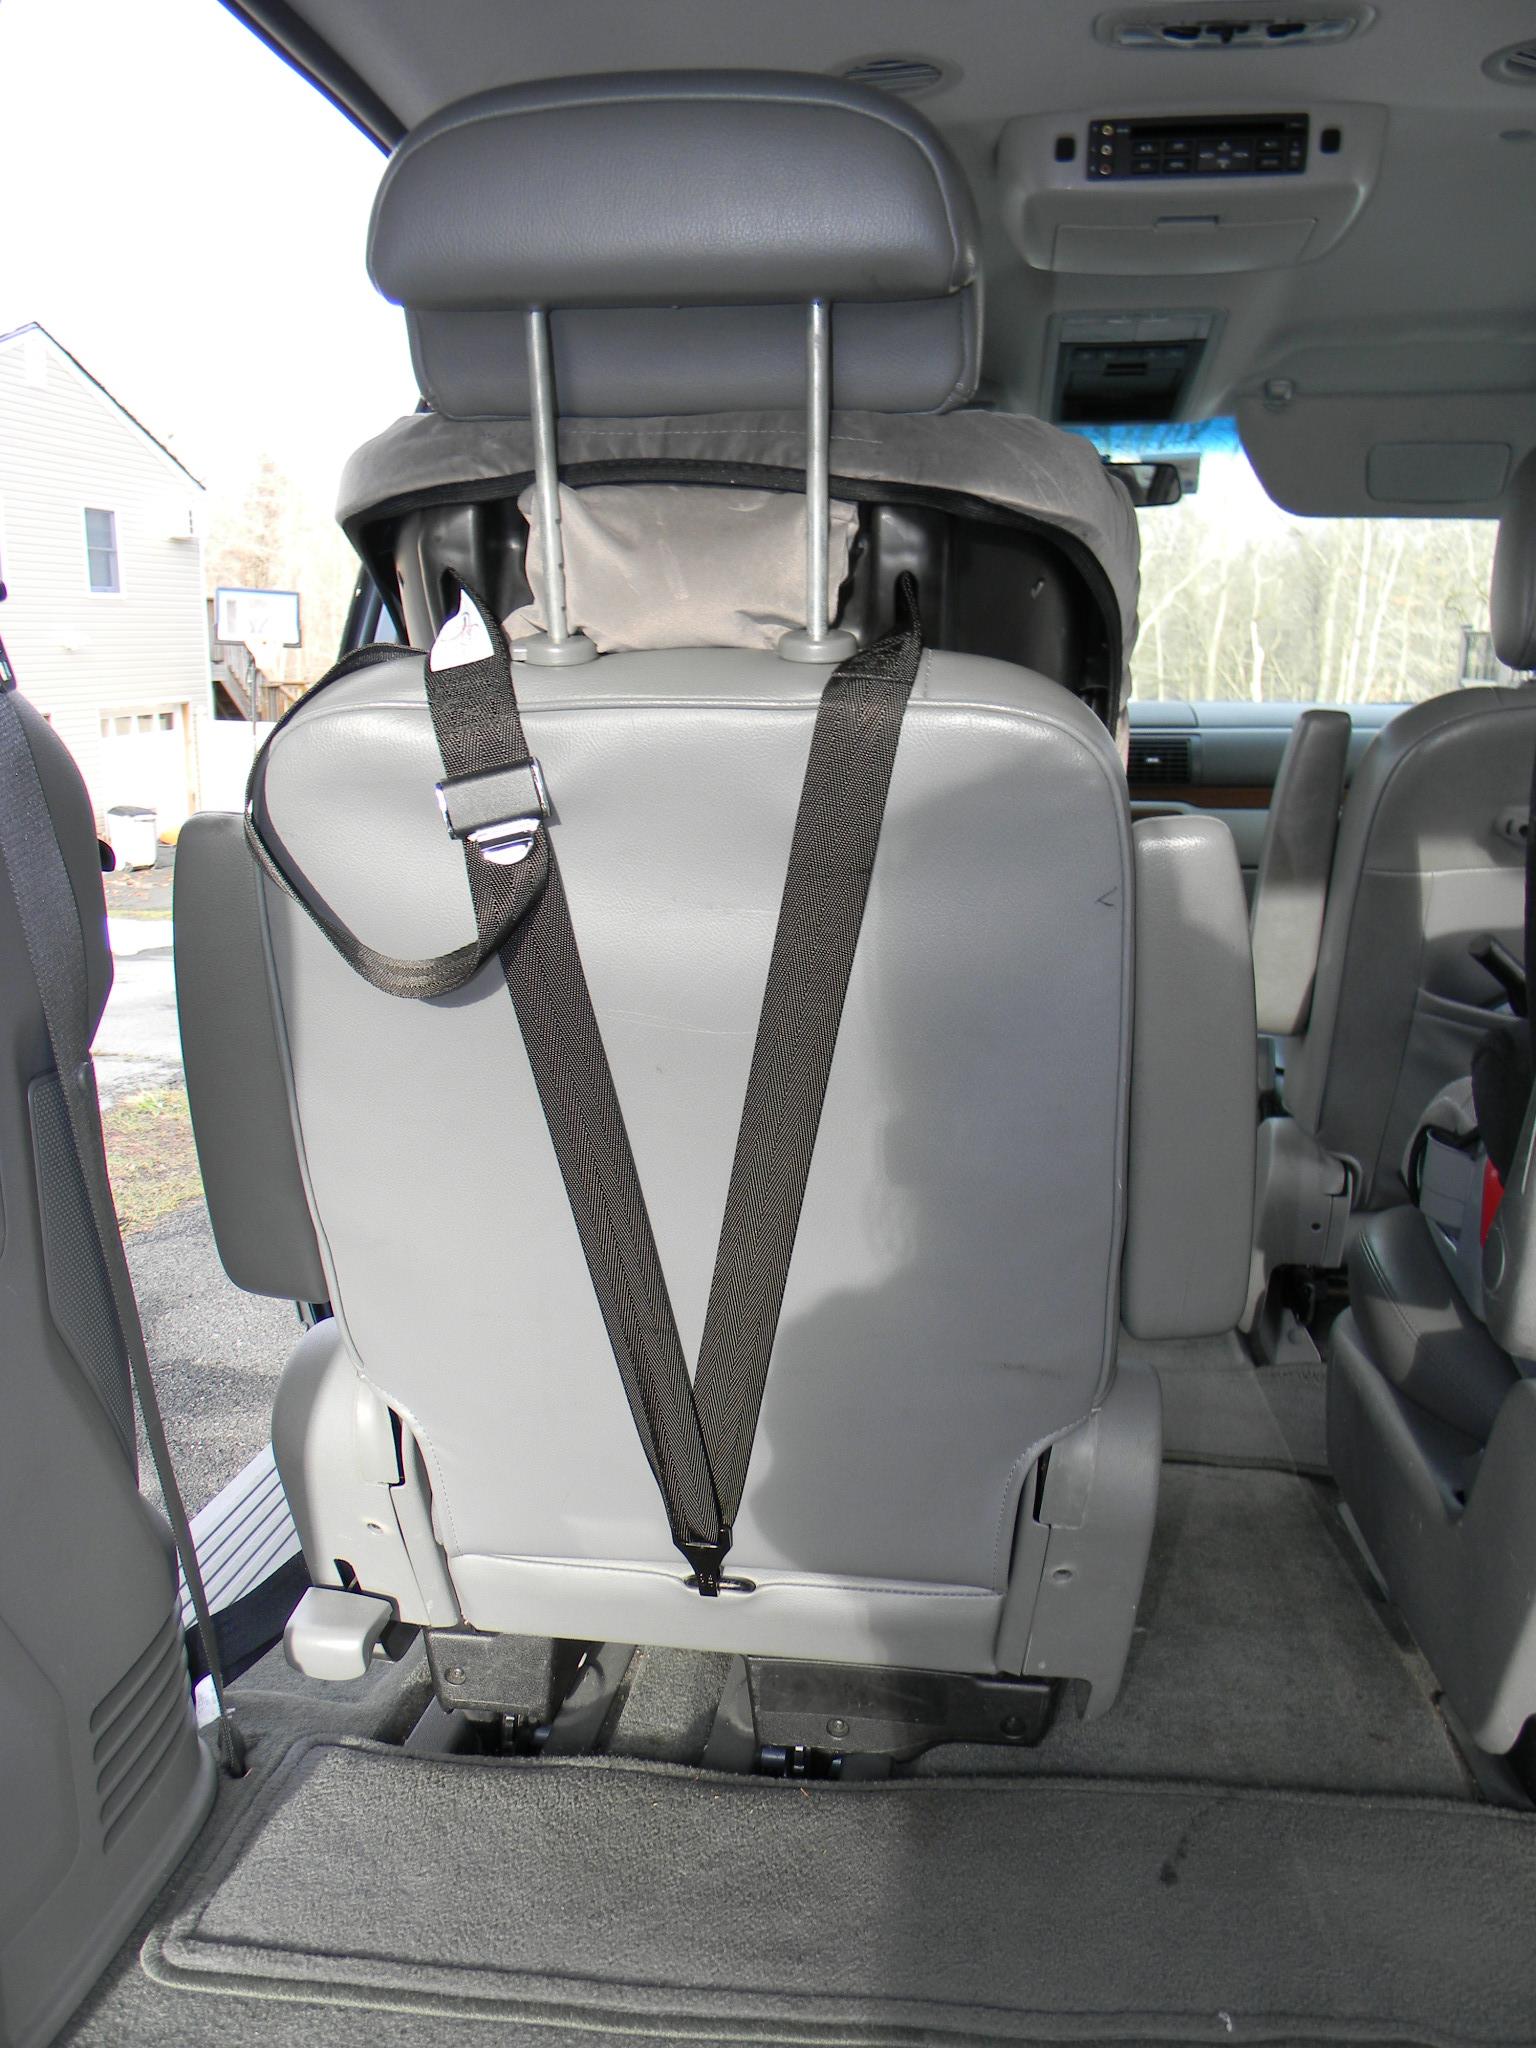 Tether Car Seat Forward Facing